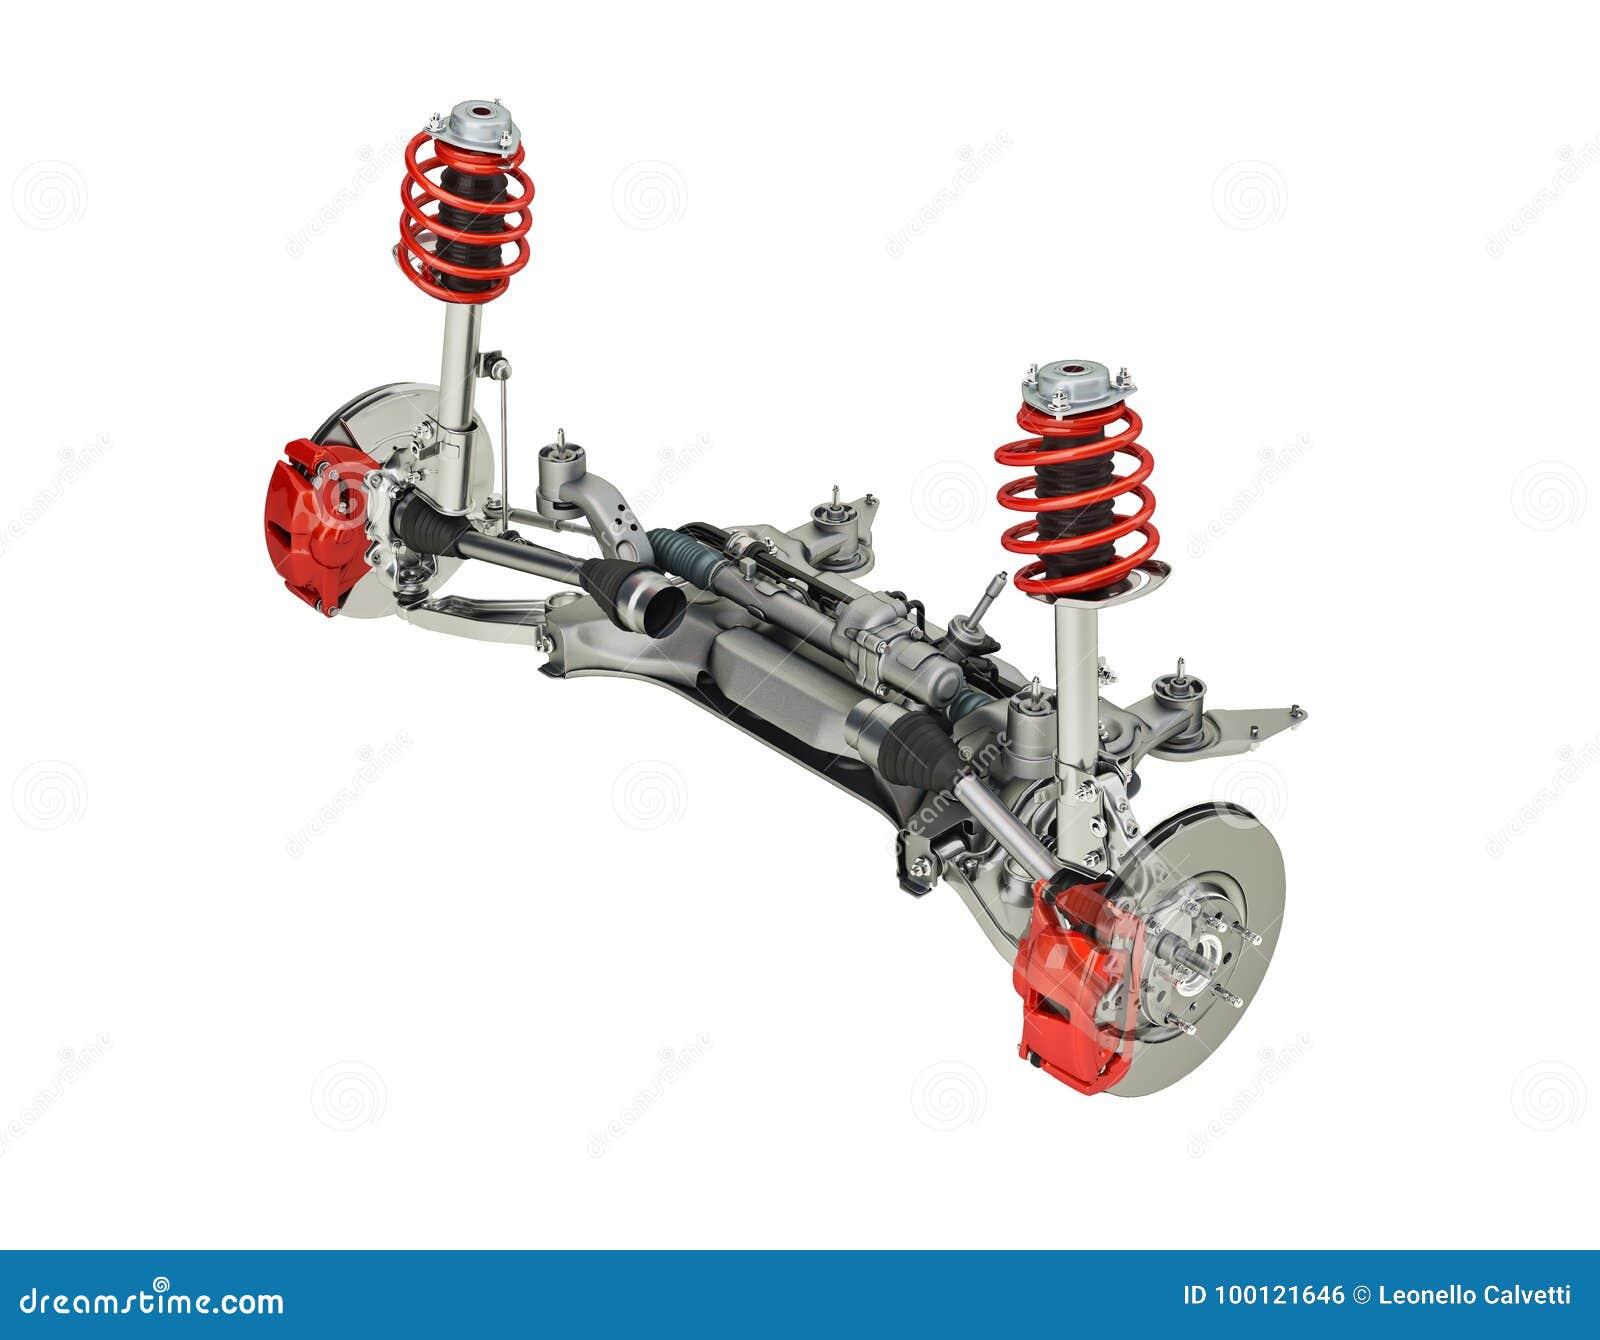 Multi Link Rear Suspension: Suspension Cartoons, Illustrations & Vector Stock Images